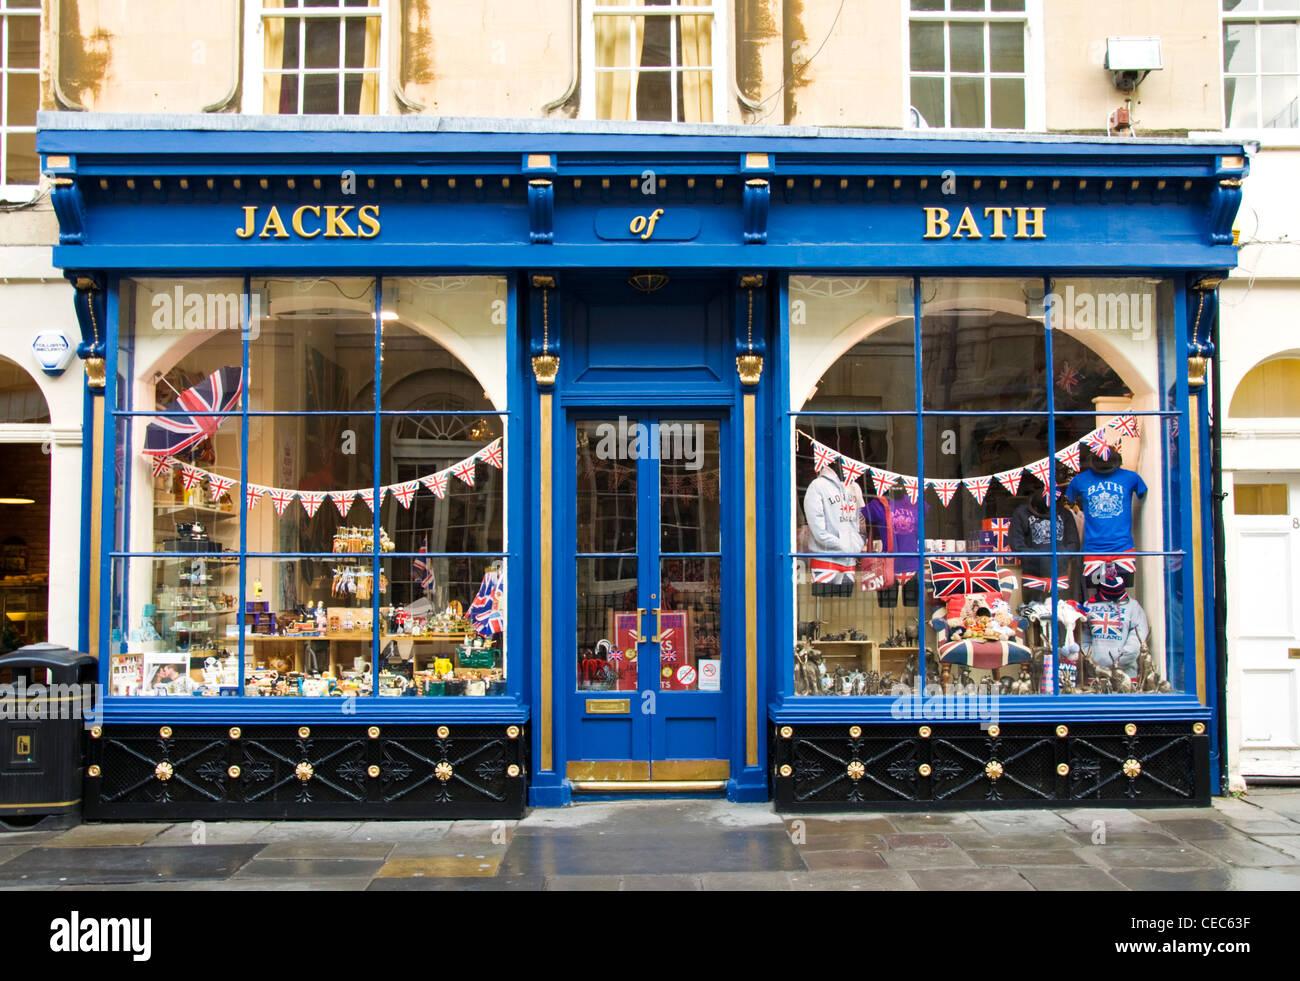 Jacks of Bath tourist gift shop Stock Photo: 43294147 - Alamy